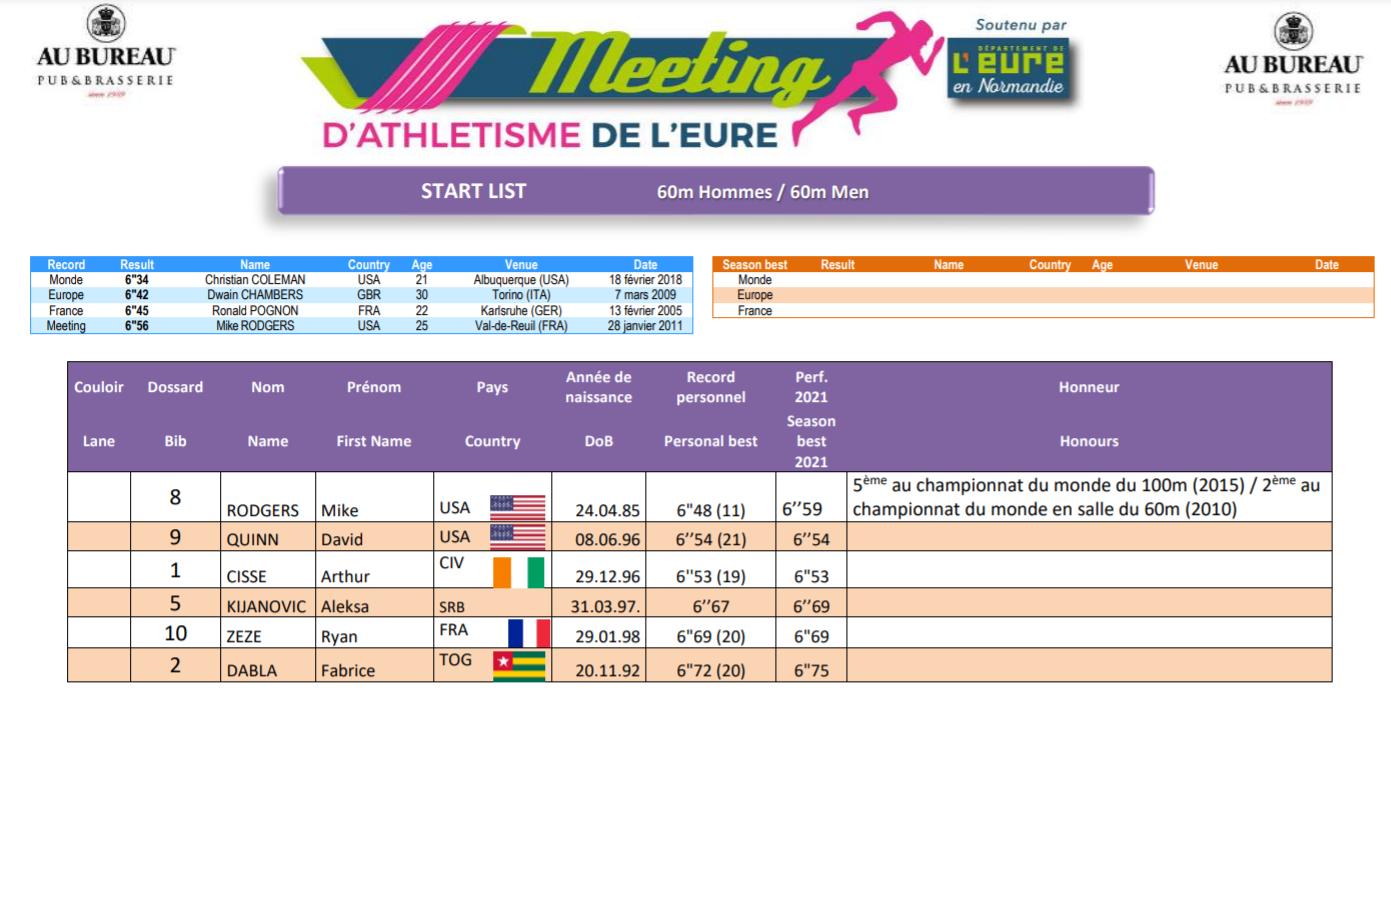 Kijanović - miting u Francuskoj 2021